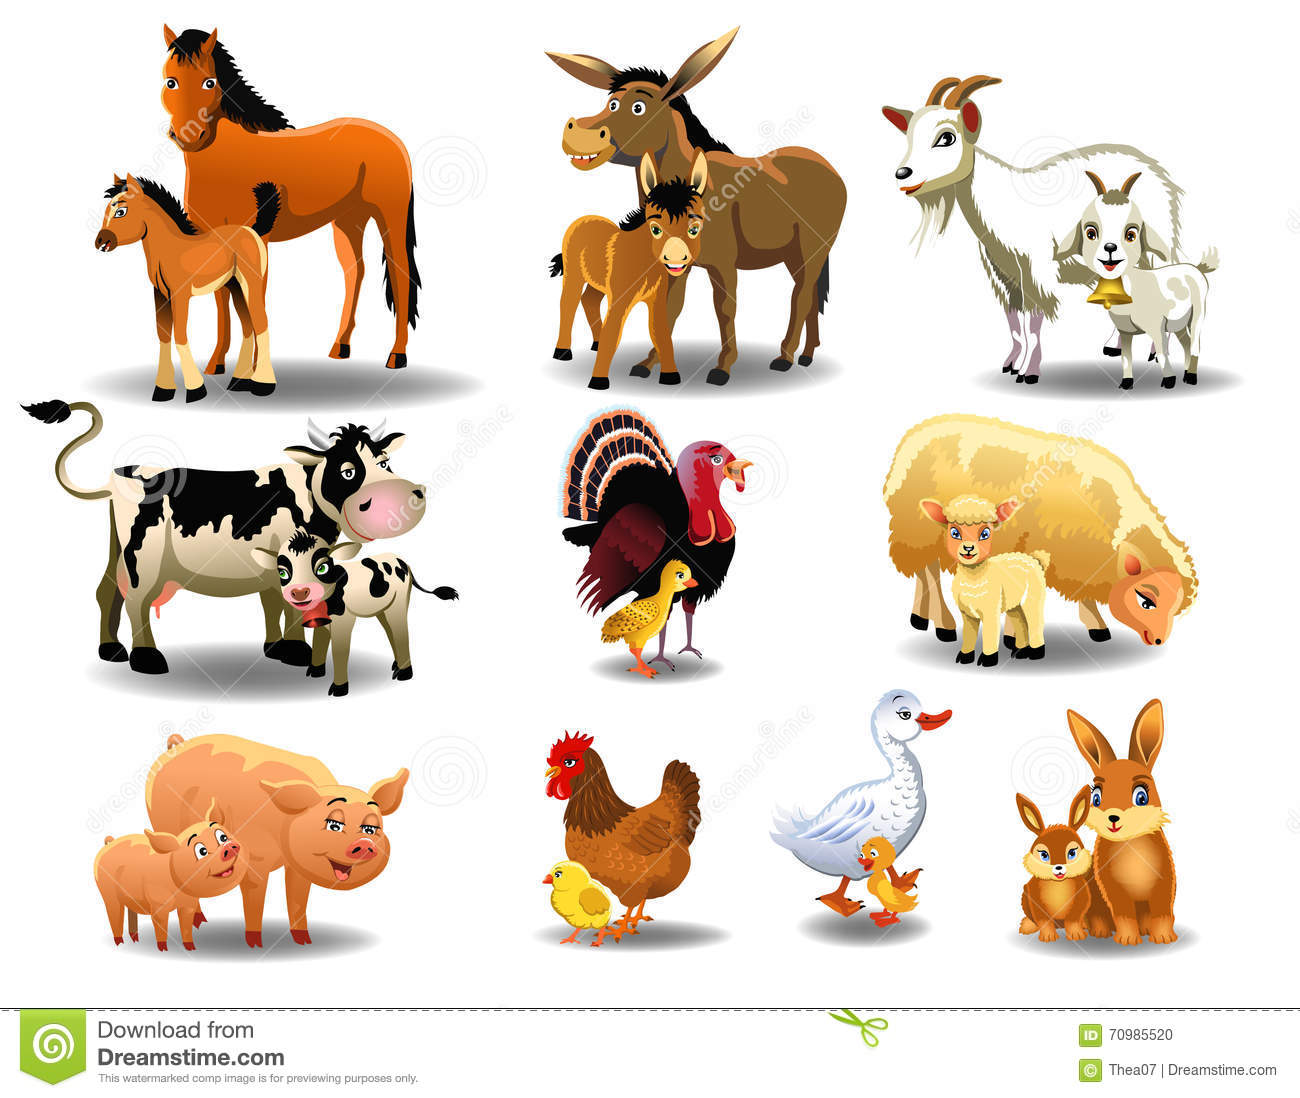 Young Animal Clipart on Illustration Worksheets For Kindergarten